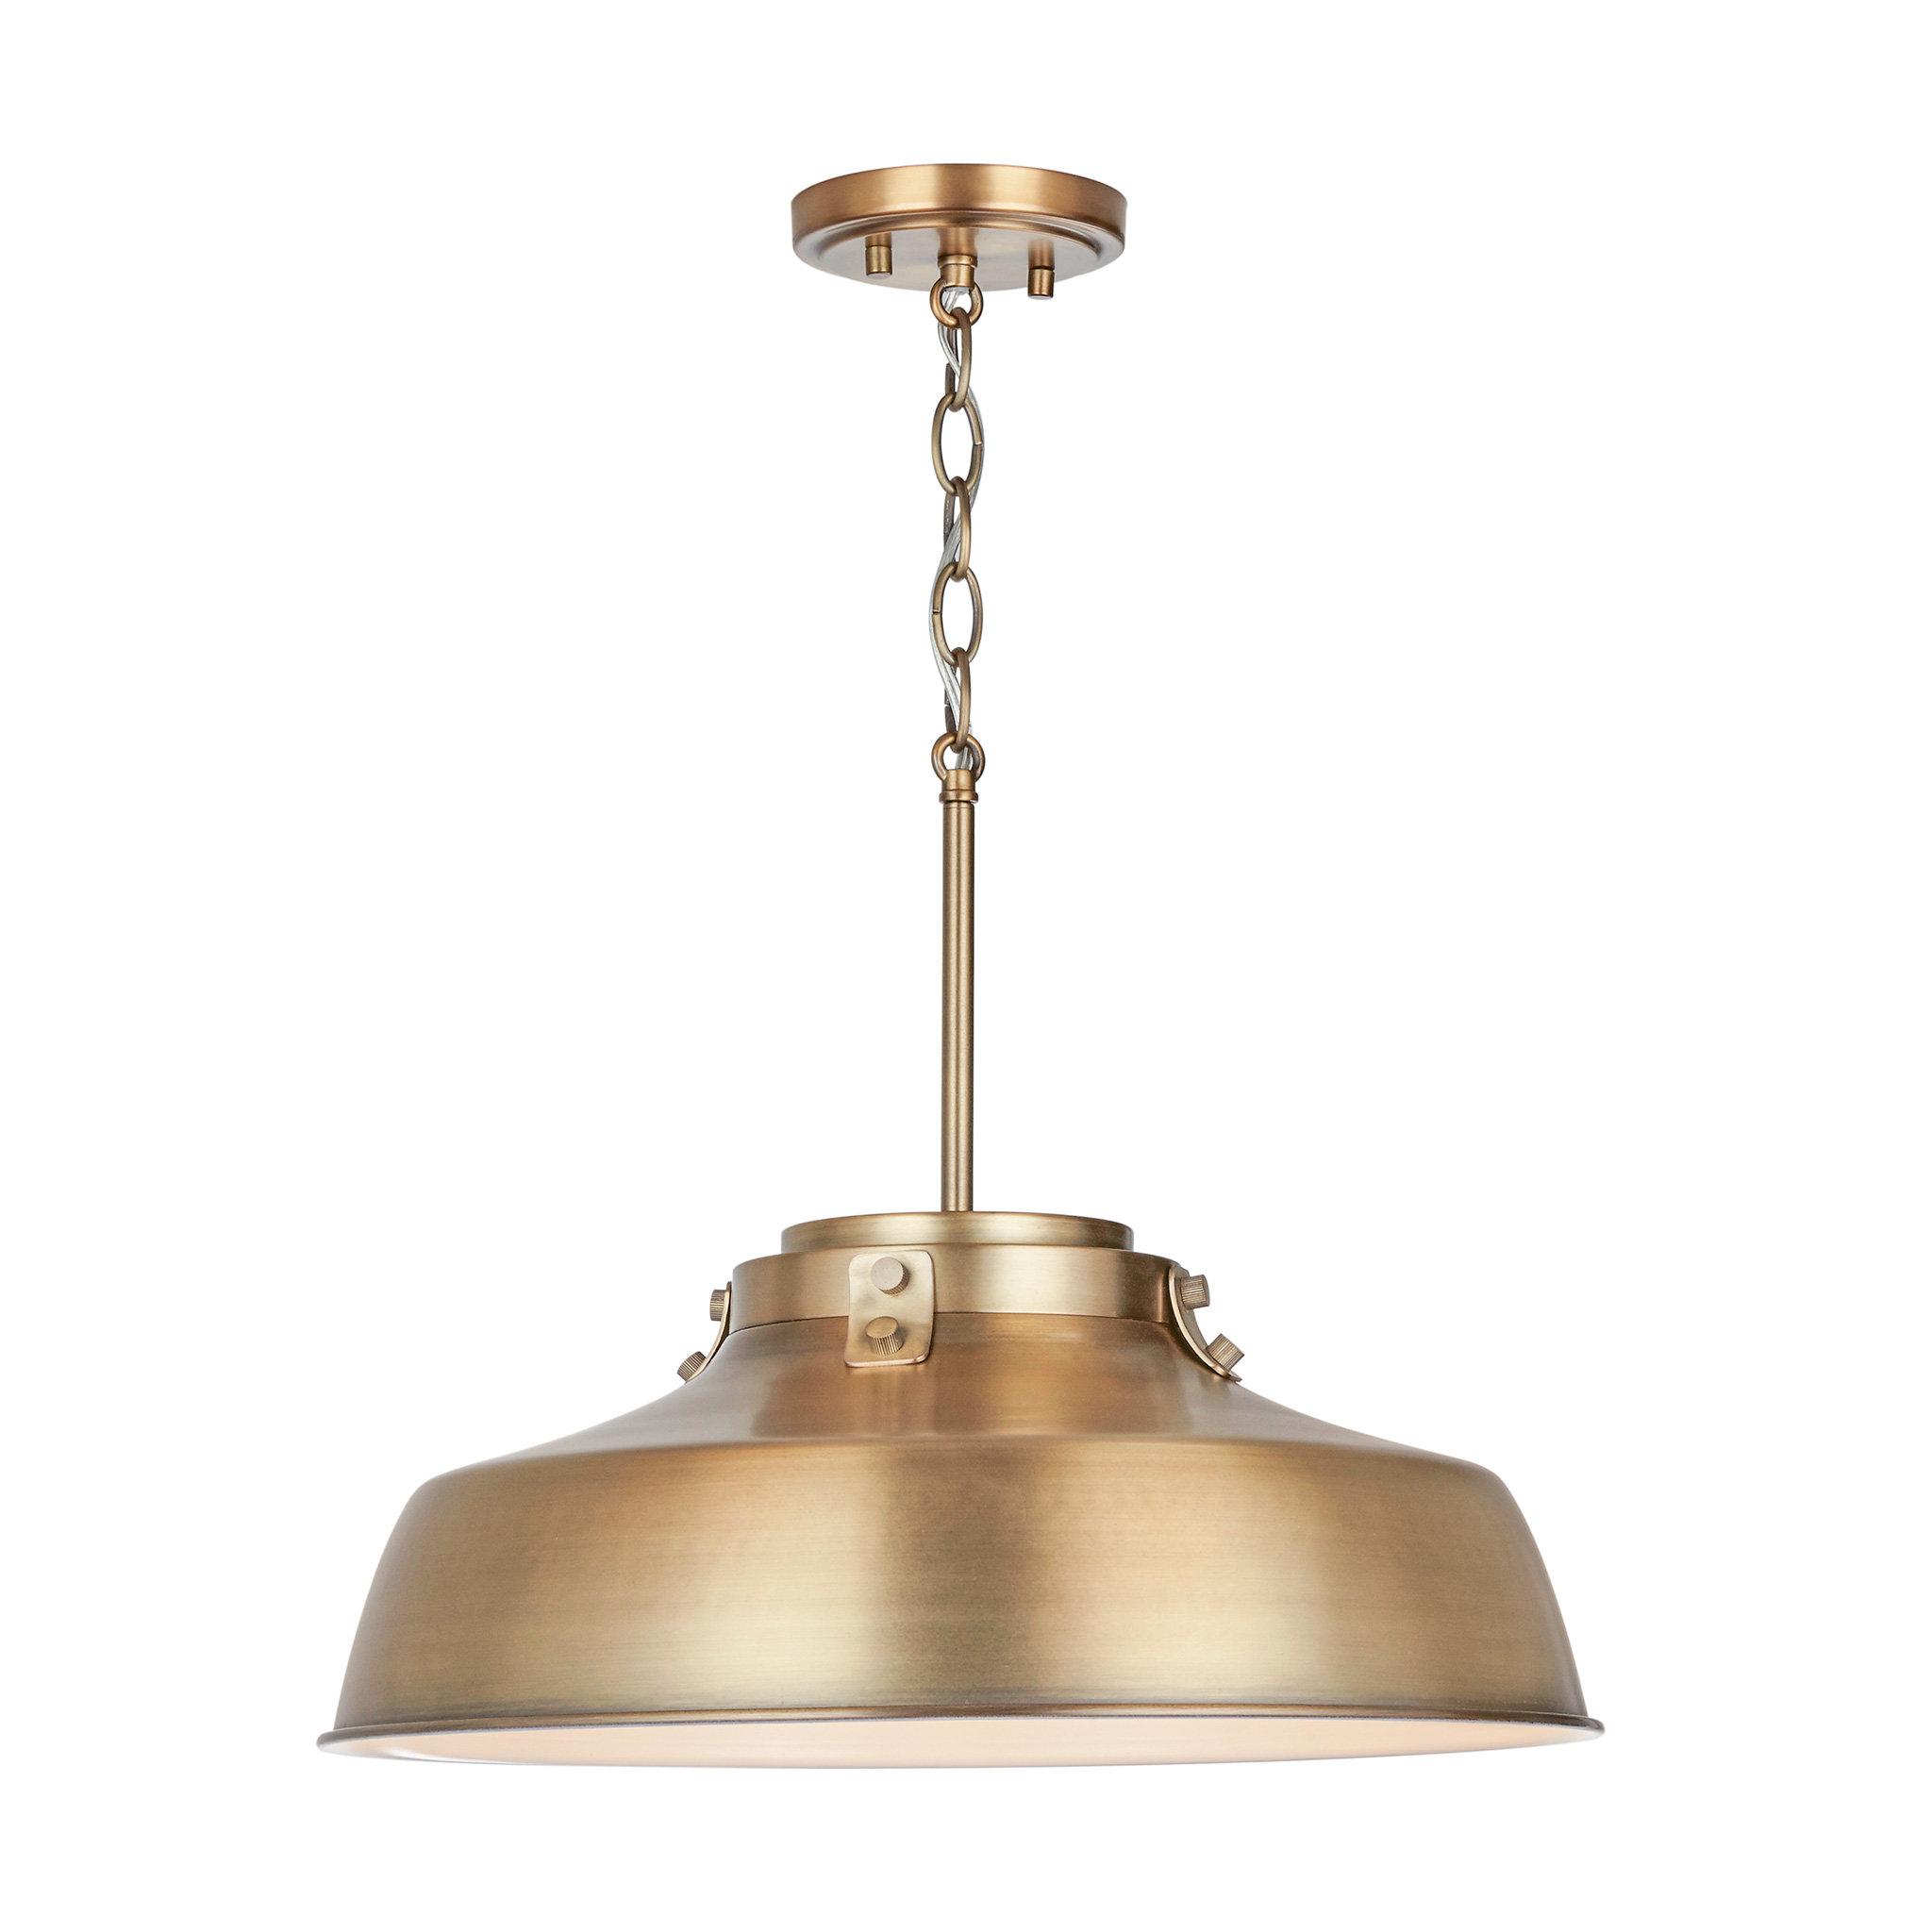 Gattis 1 Light Dome Pendants Throughout Favorite 1 Light Dome Pendant (View 10 of 20)